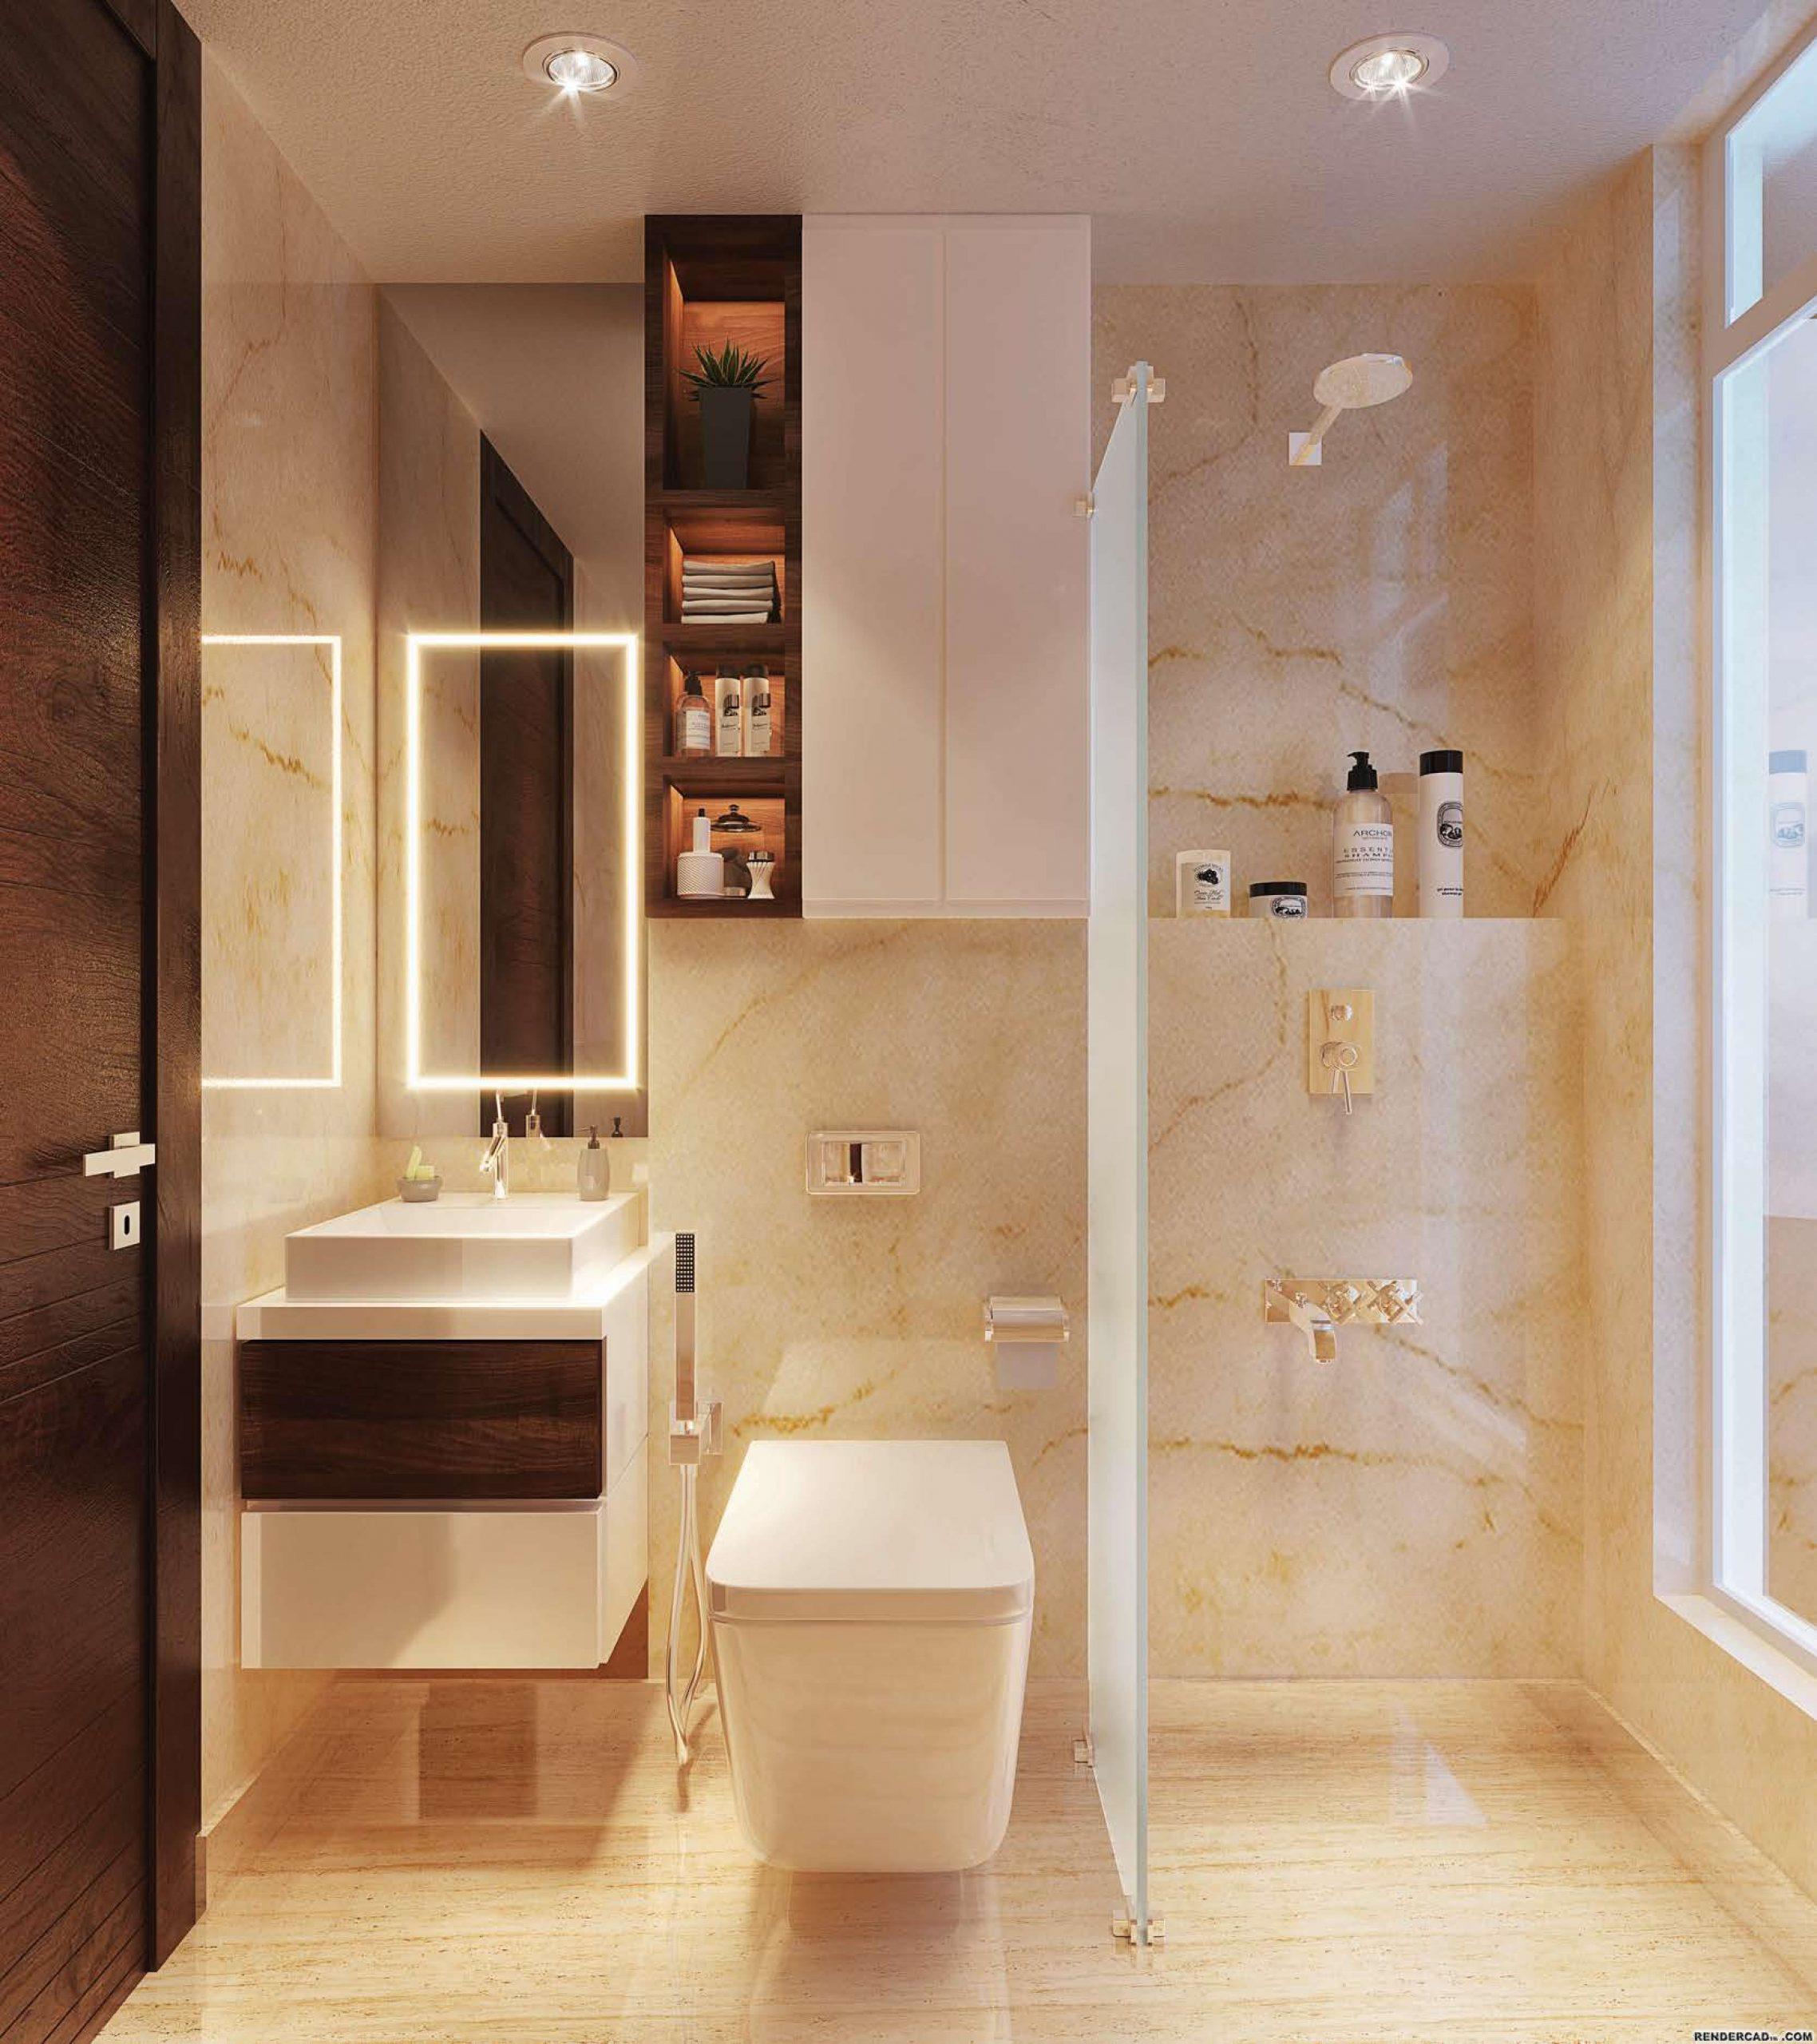 Bathroom View of Centrona